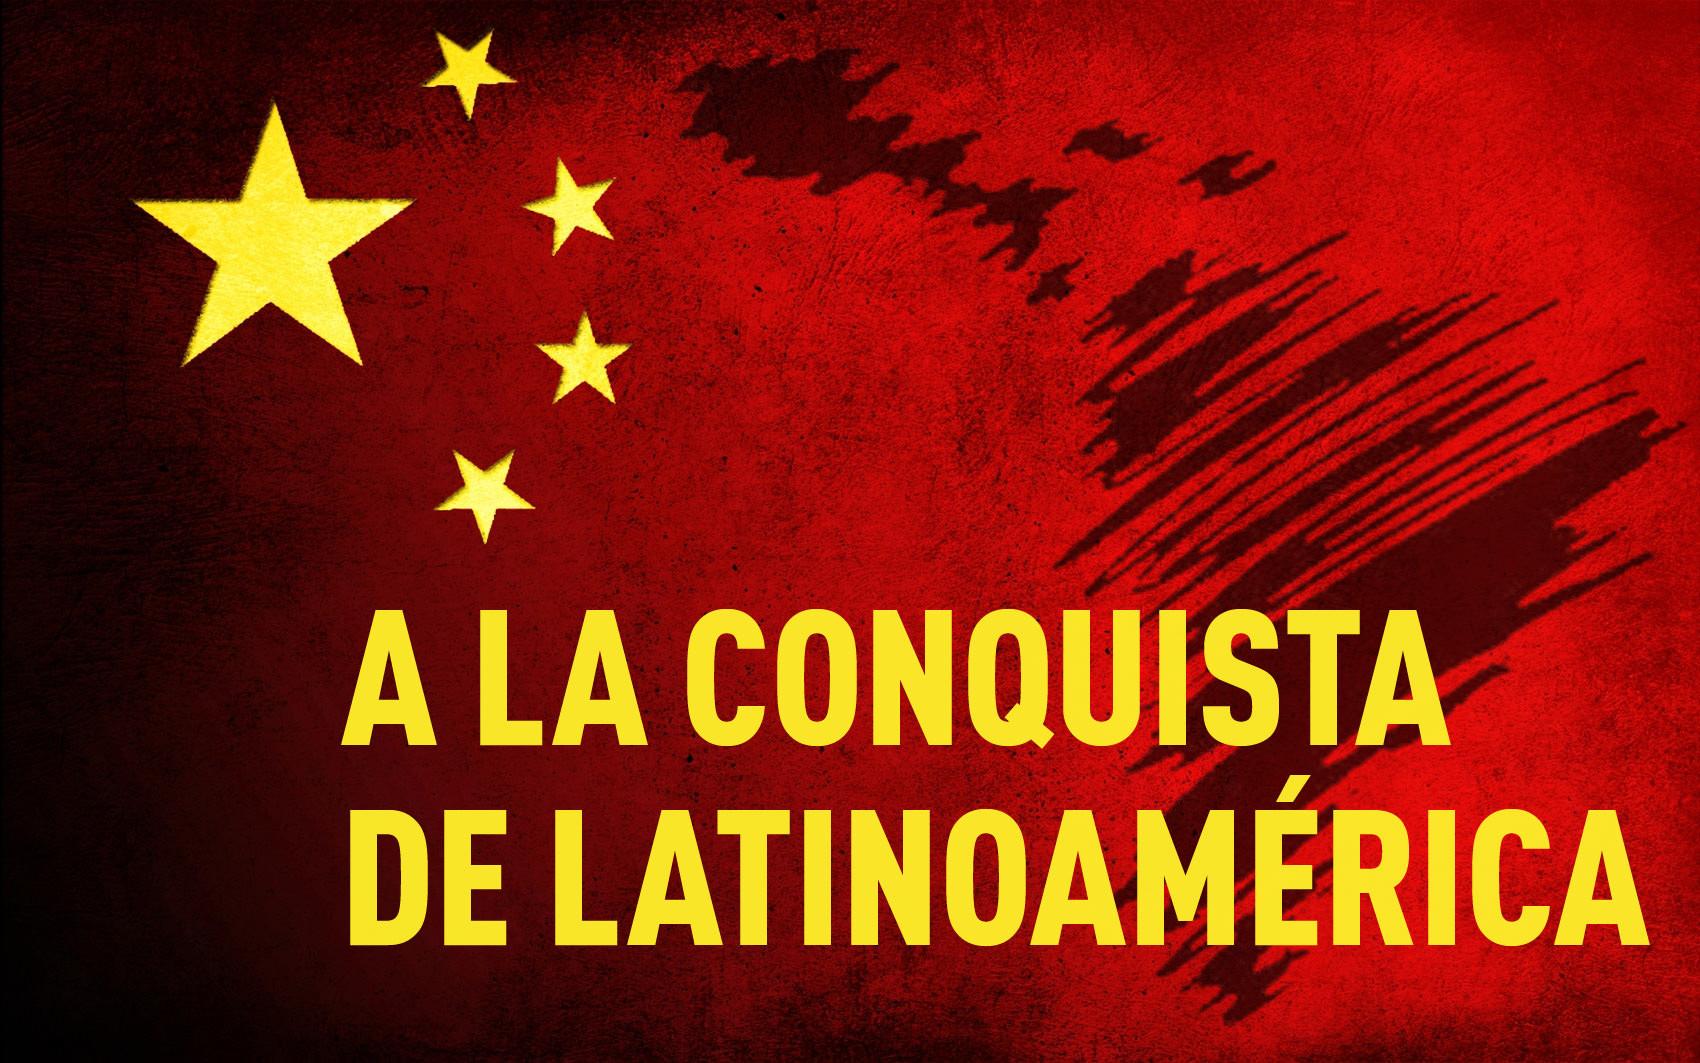 China a la conquista de Latinoamérica - RT